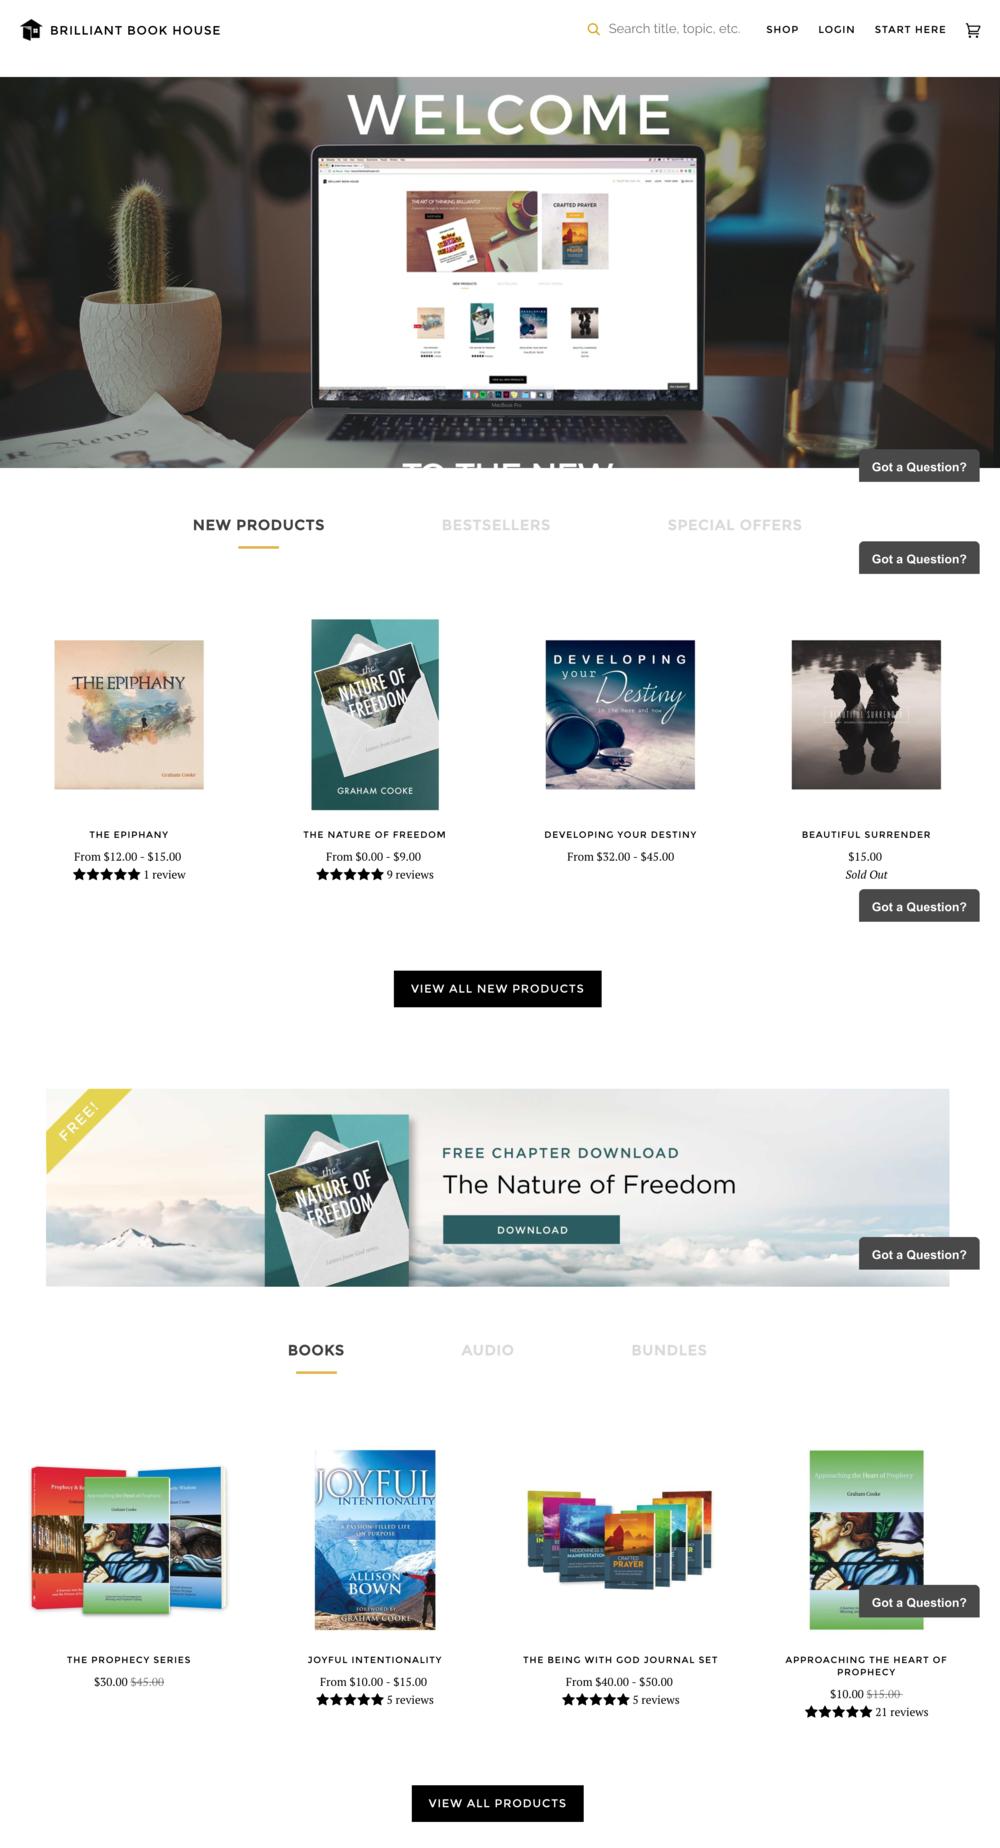 Launched eCommerce platform